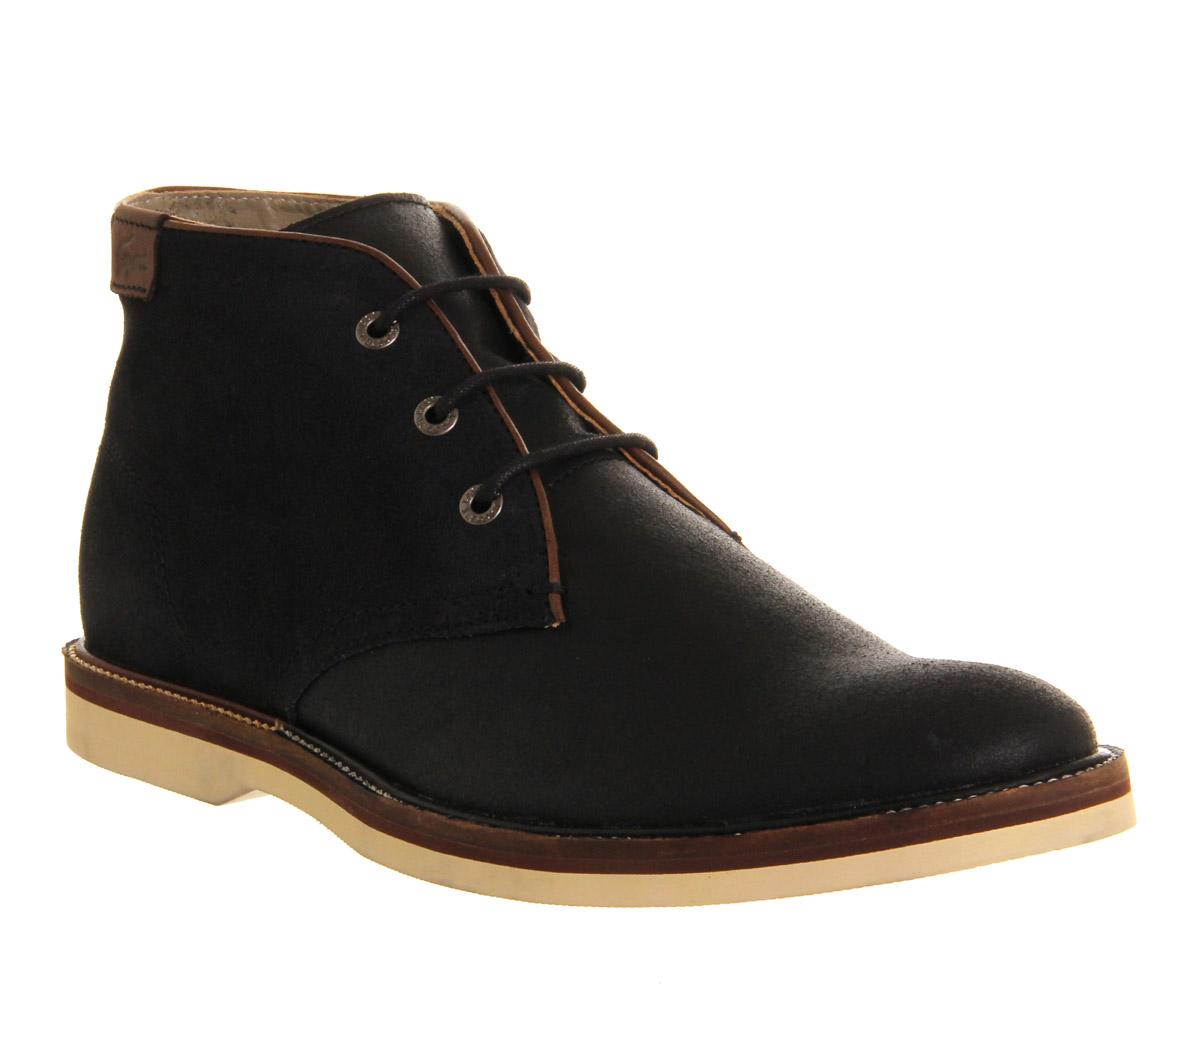 Lacoste Sherbrooke Boots In Black For Men Lyst